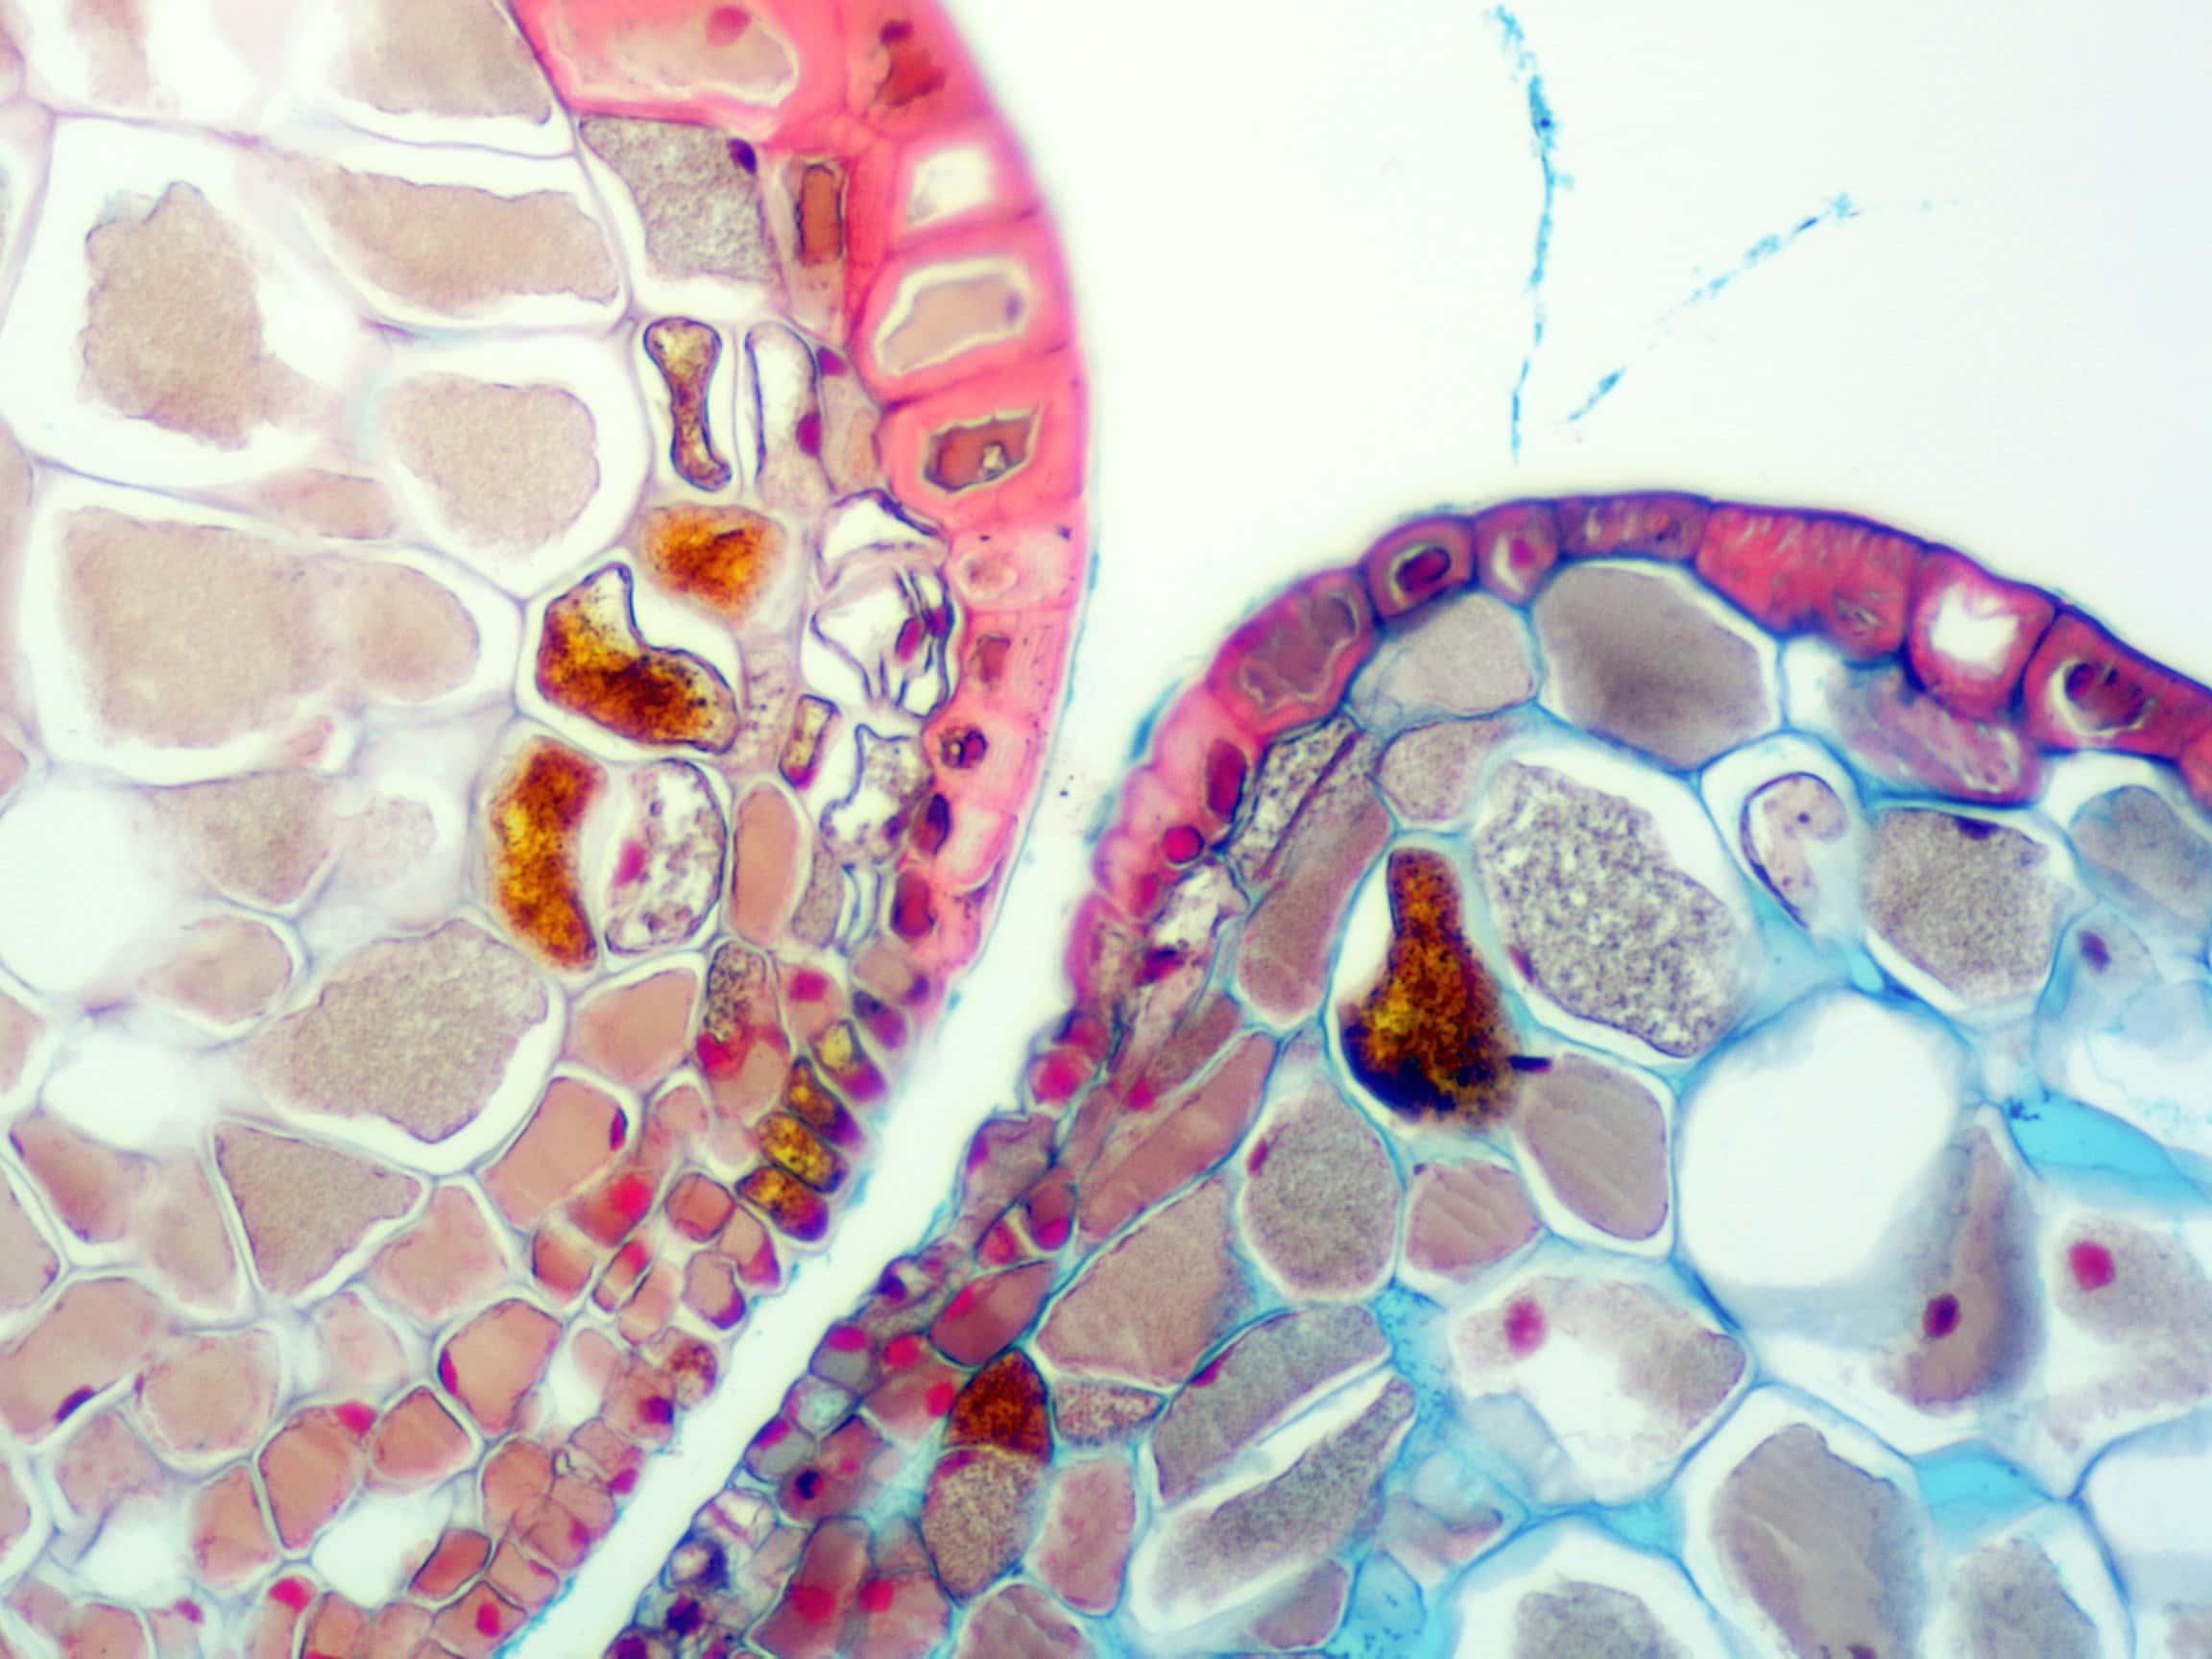 PLH019 - Pine Life History - Valley Microscope